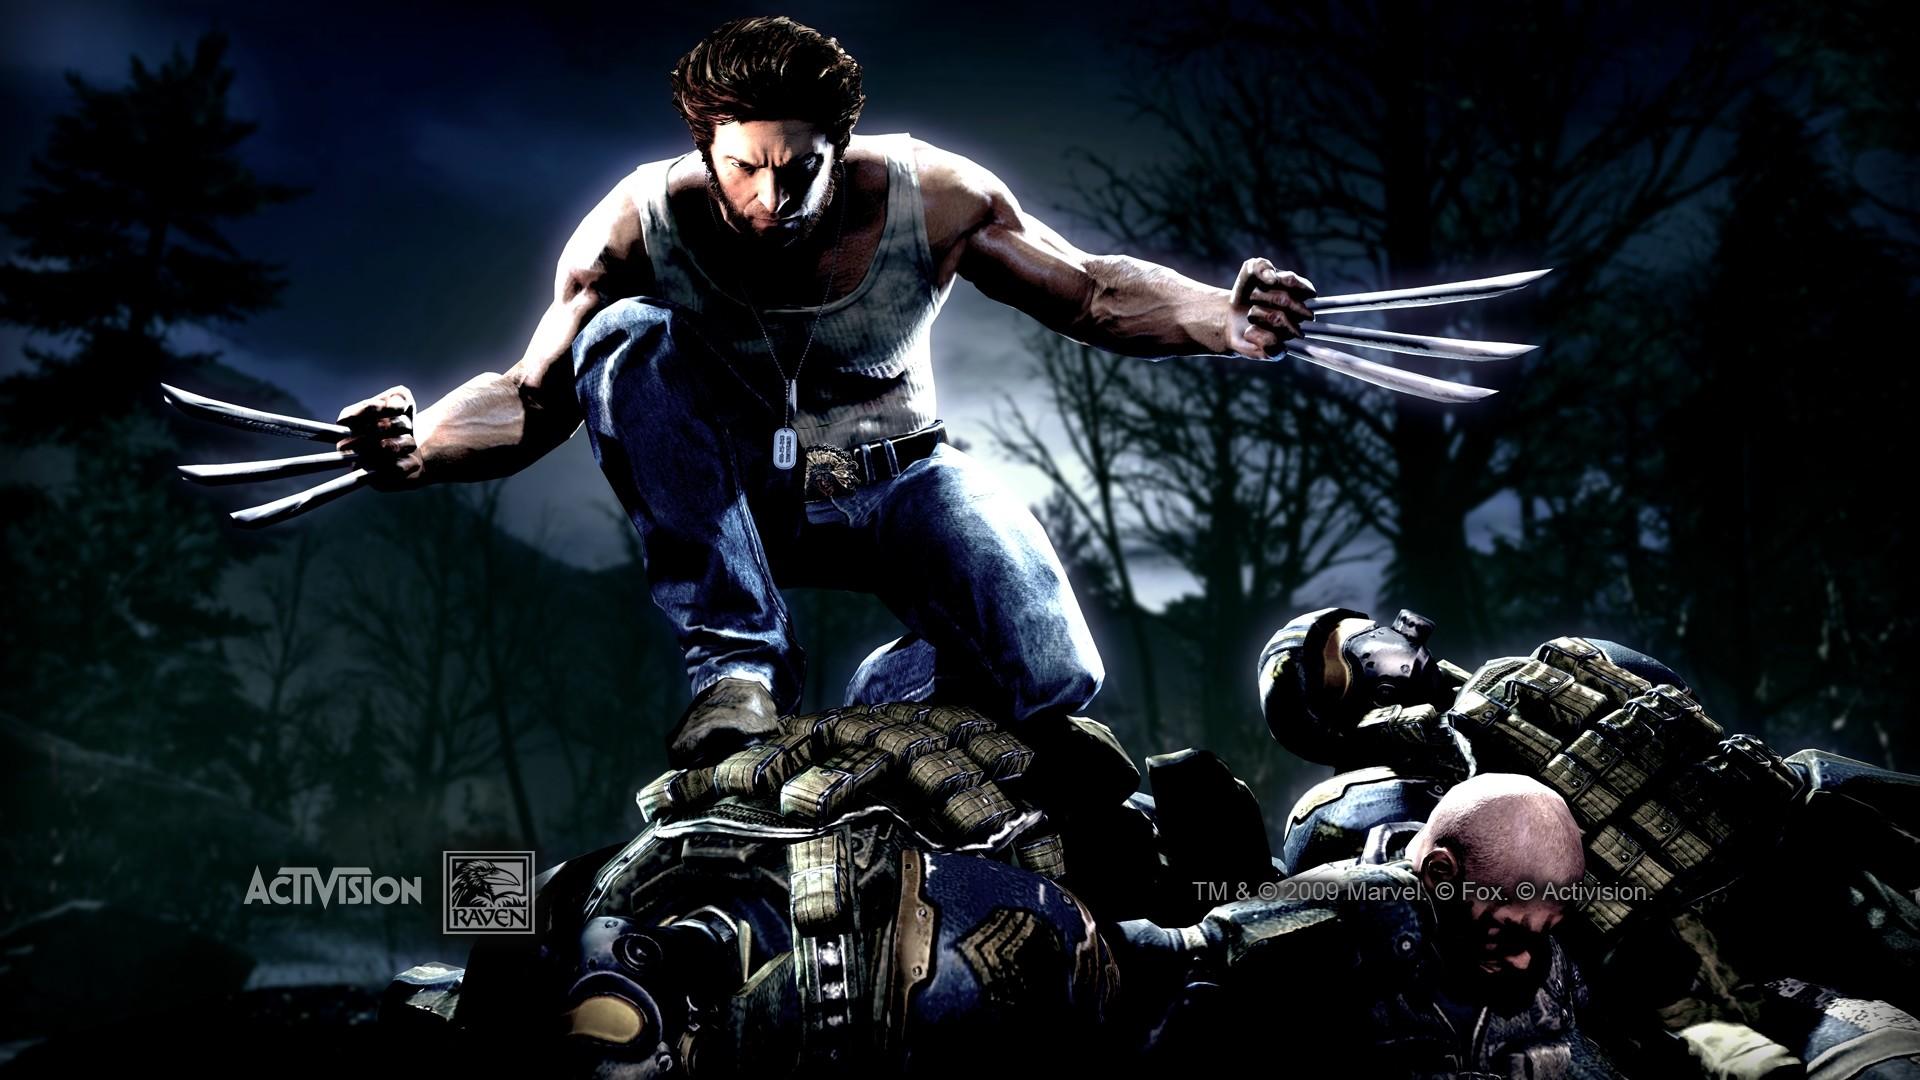 x men origins wolverine game